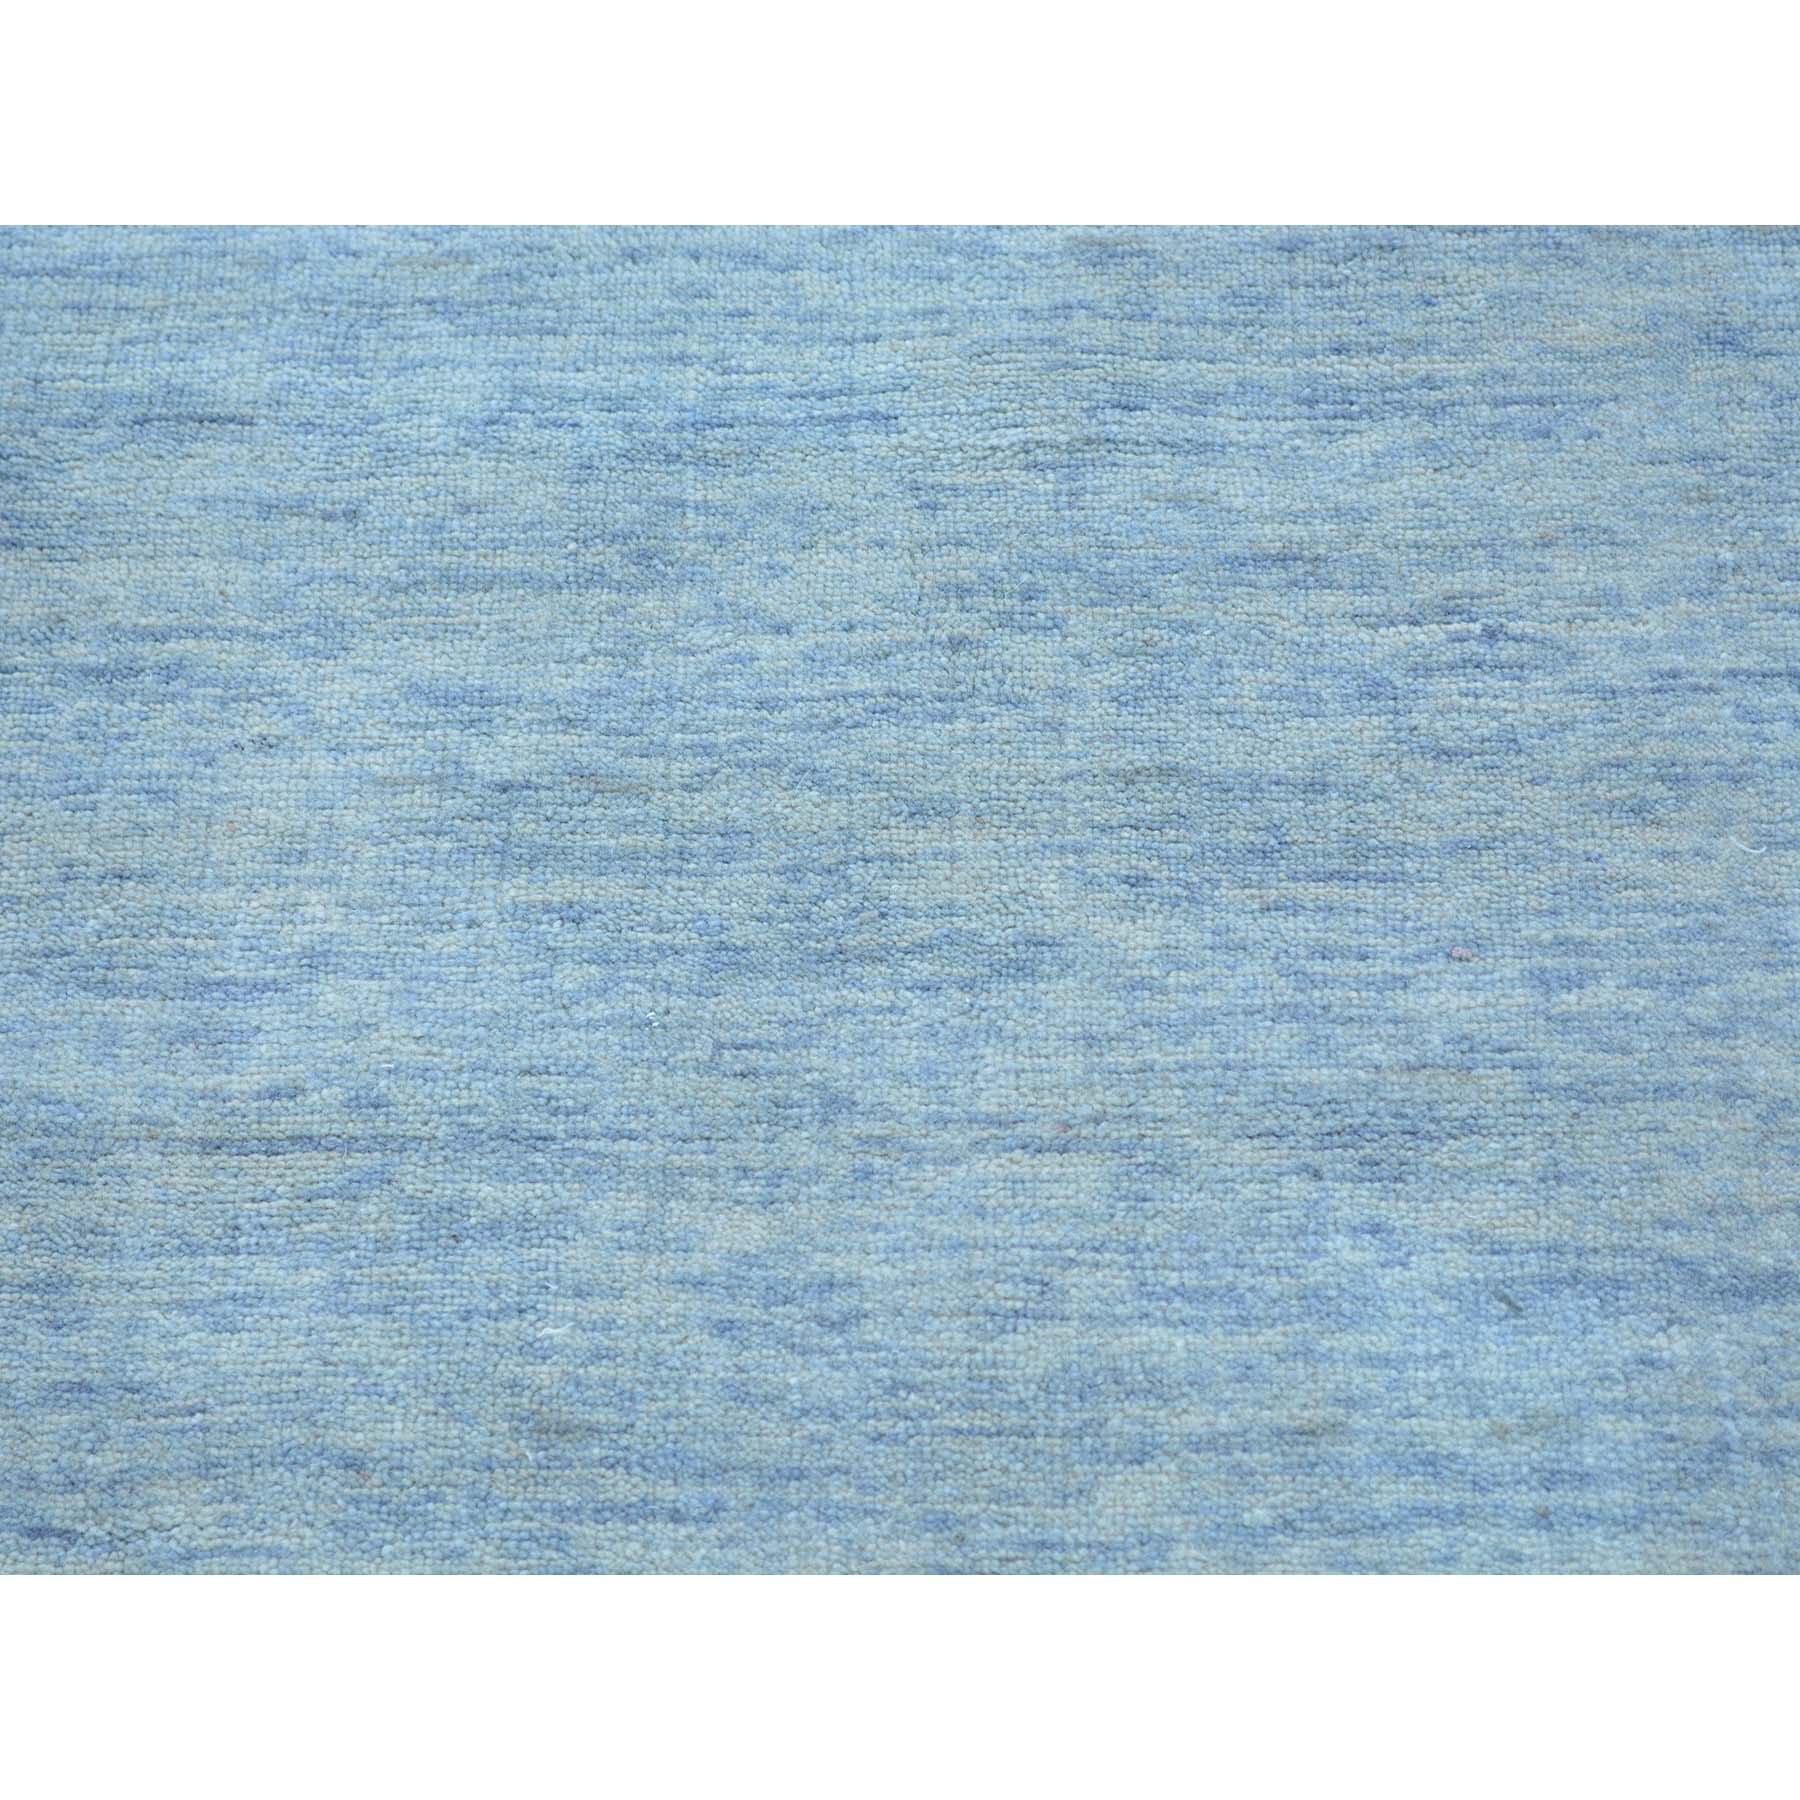 2-x3- Pure Wool Modern Hand Loomed Gabbeh Oriental Rug